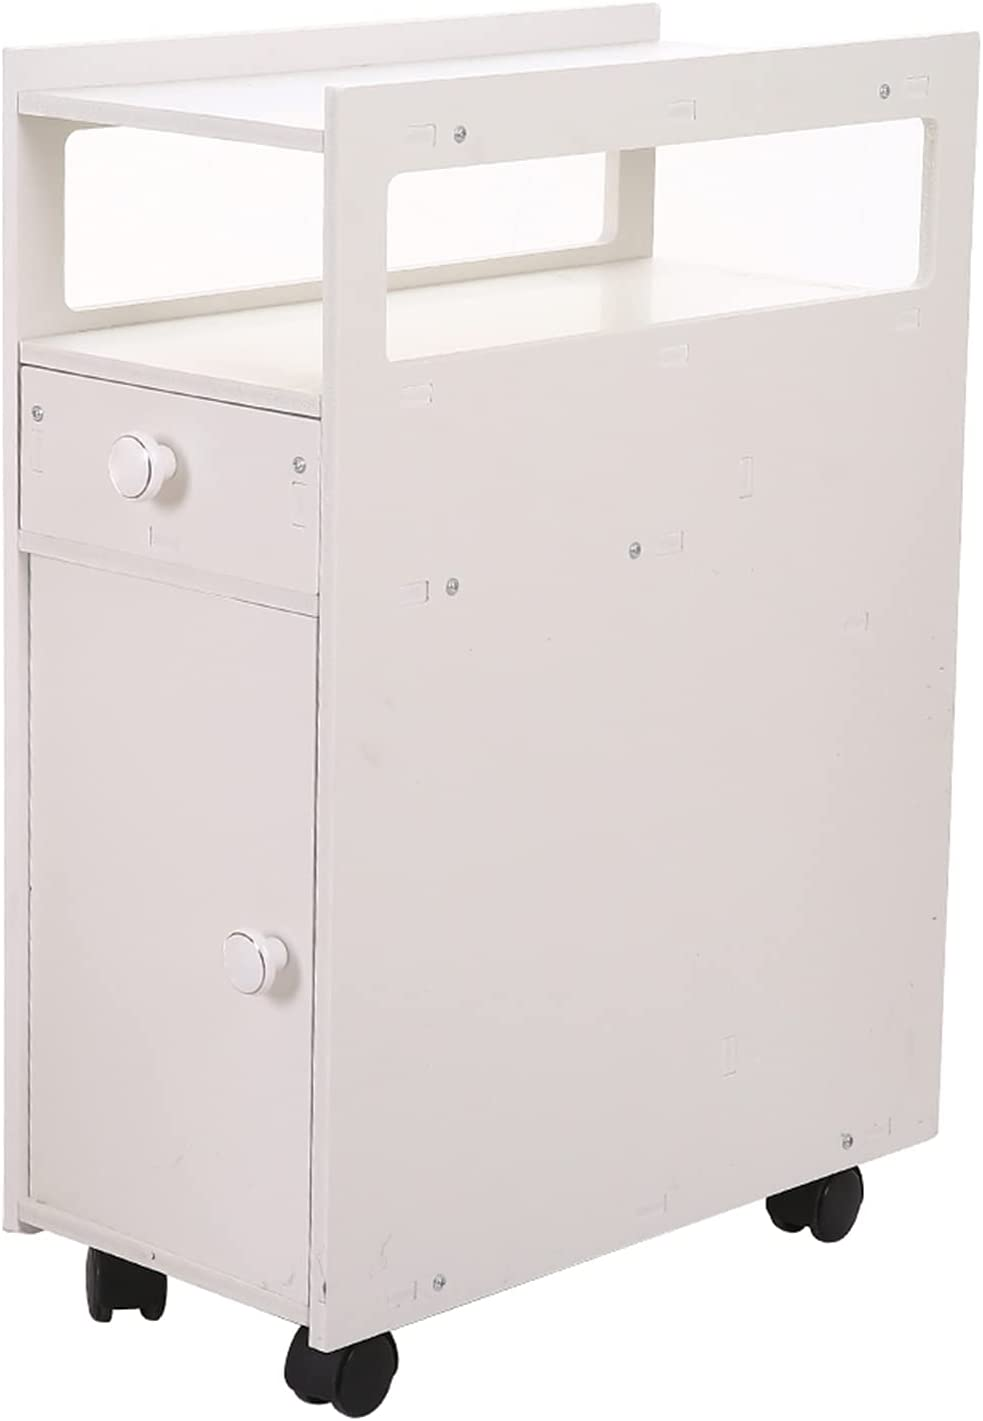 Savins gt1-zj 22 High quality new x 45 OFFer 63cm Bathroom Narrow Cabinet with Shel